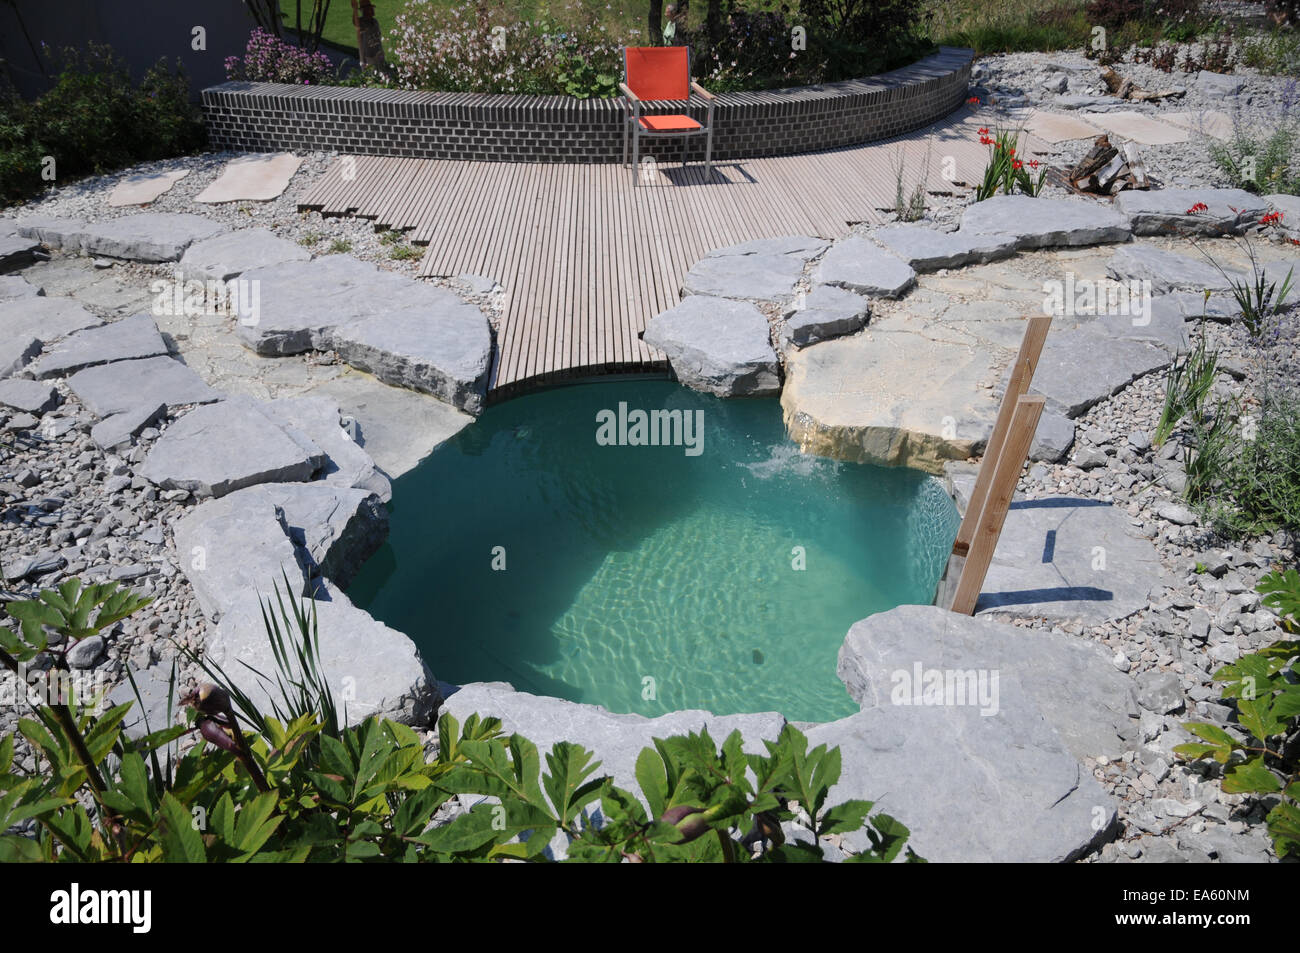 Natur Pool Stock Photo 75120352 Alamy